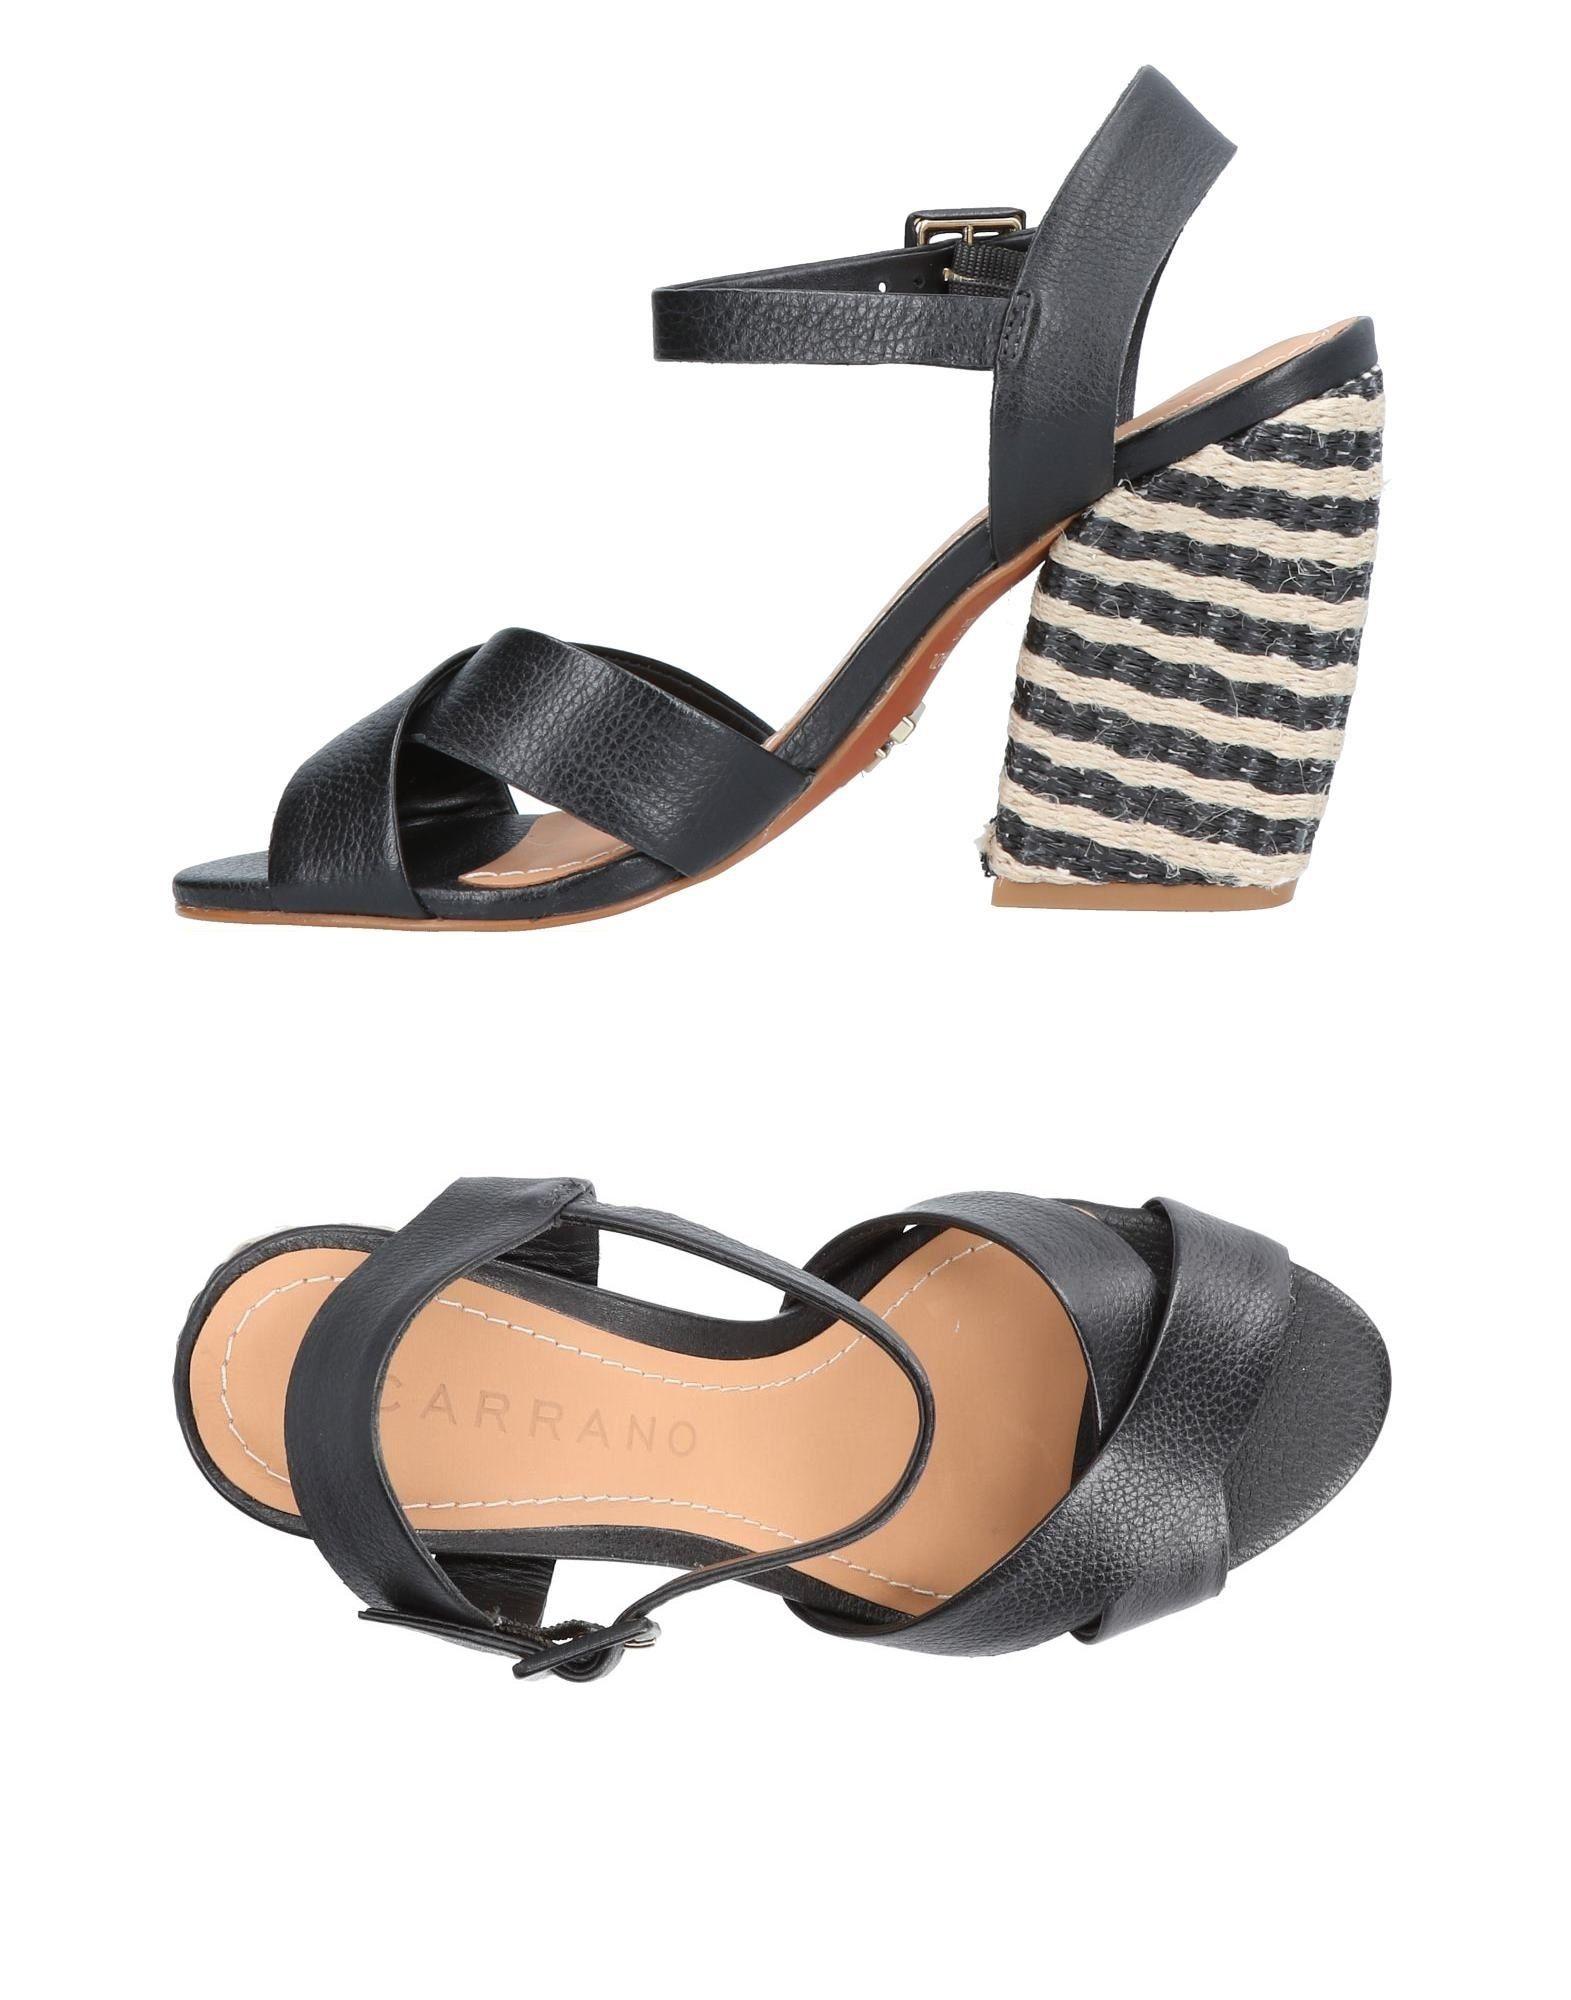 Moda Sandali Carrano Donna - 11447340FE